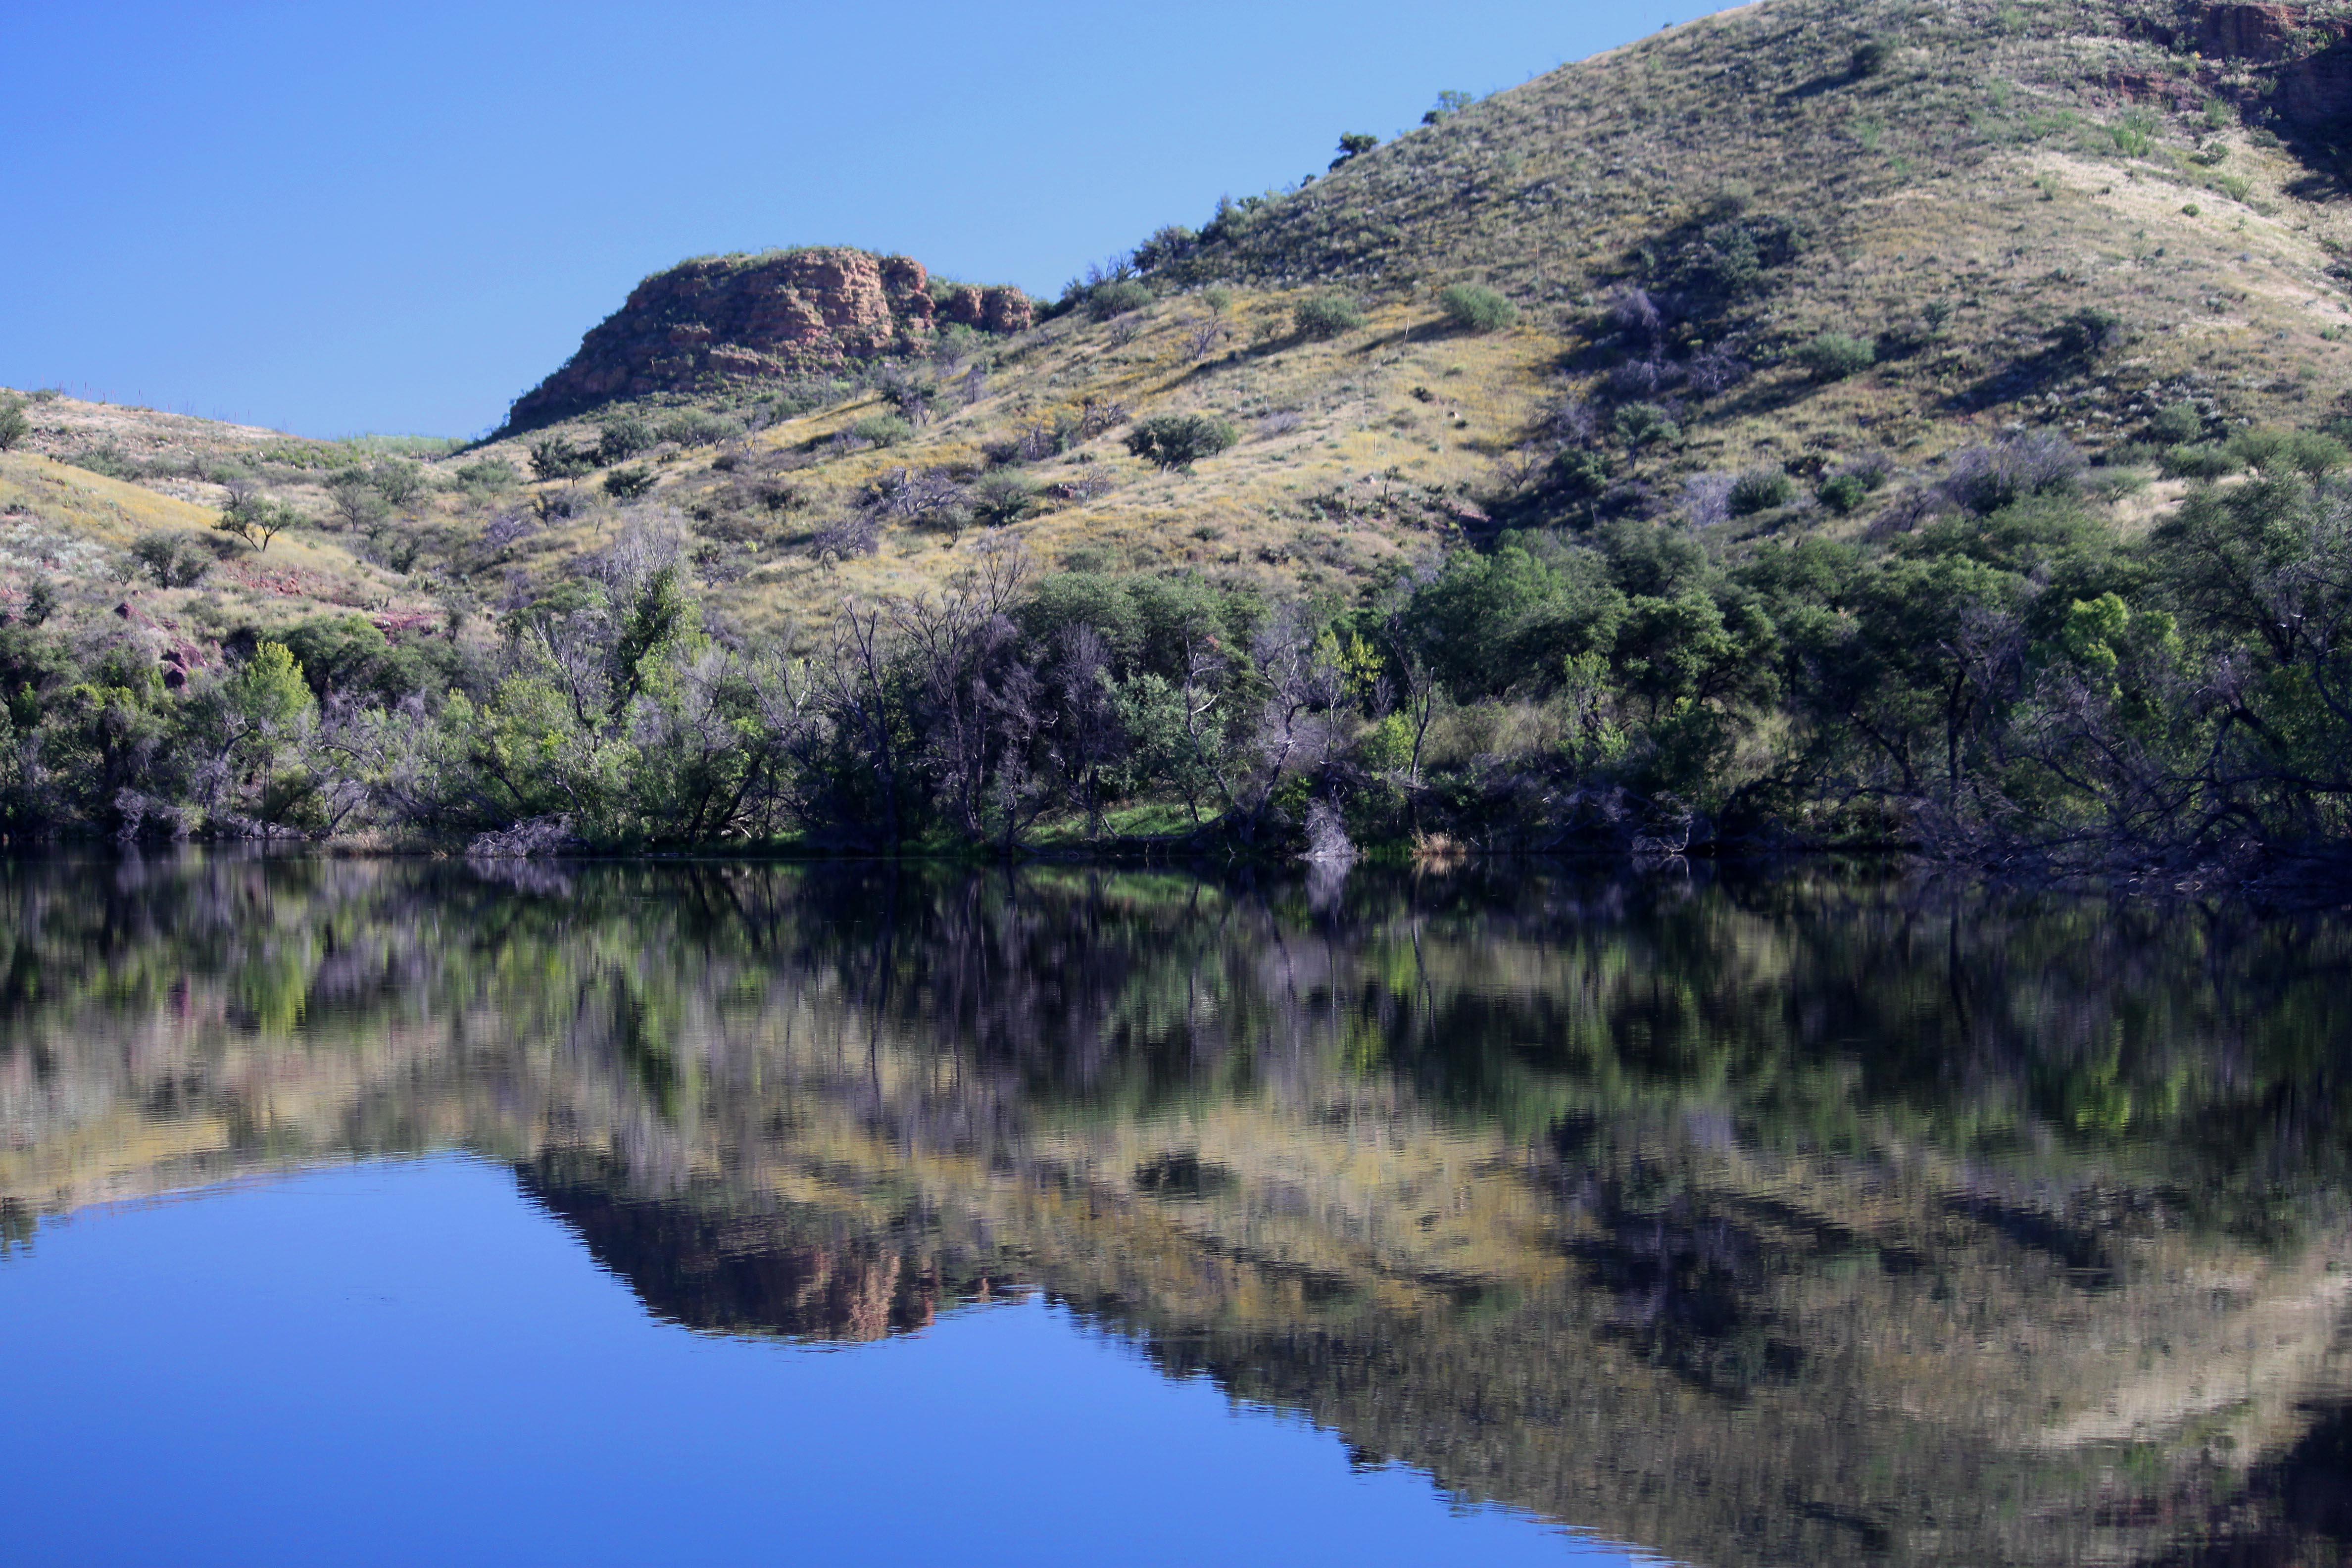 PENA BLANCA LAKE (10-13-10) west of nogales, scc, az -03, Outdoor, Mountainside, Mountain, Landscape, HQ Photo